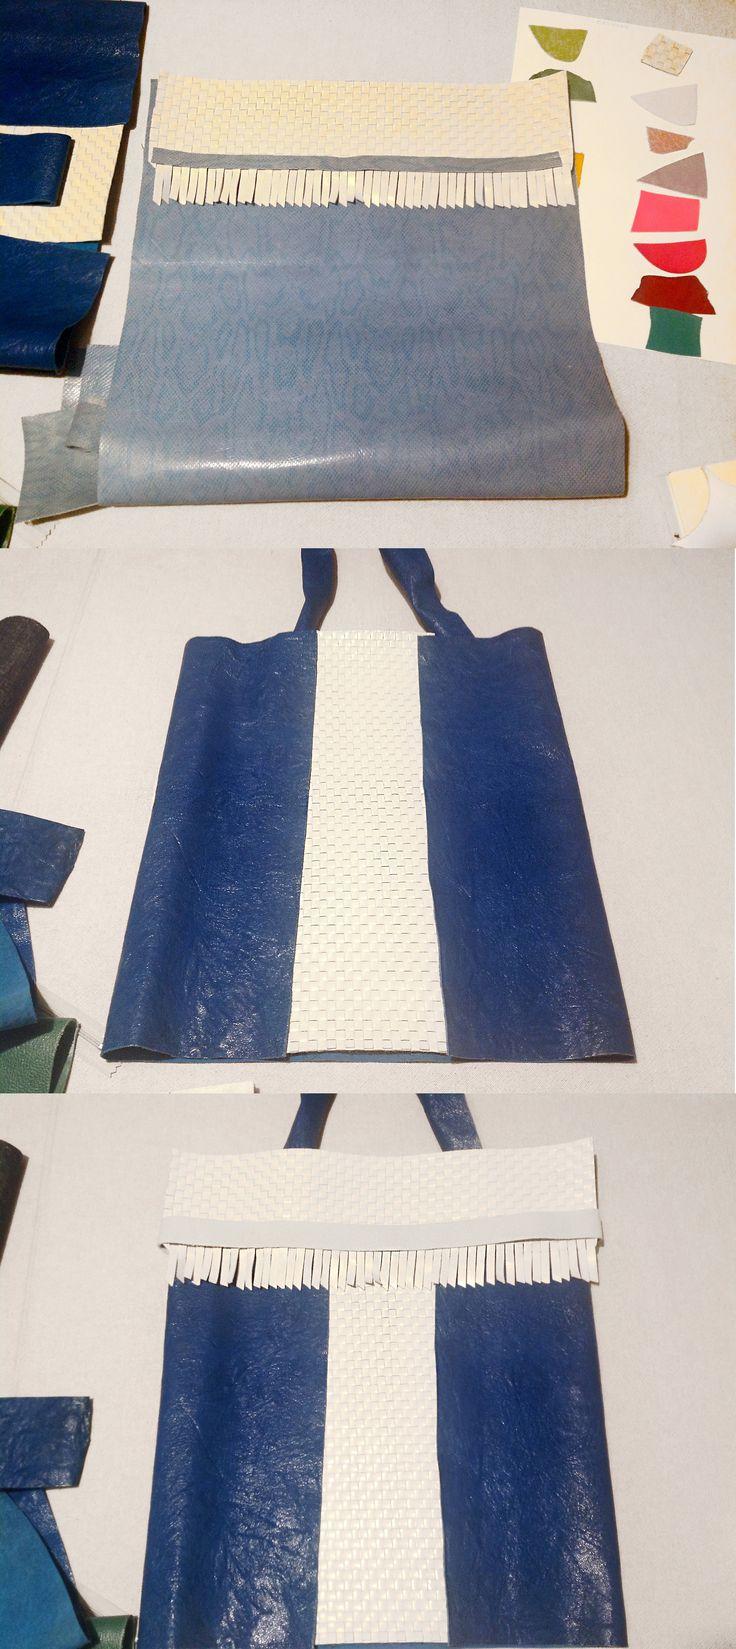 Blue ideas !  #bags #backpacks #crossbody #purses #clutch #leather #fashion #girl #womanaccessories #stylish #womanish #Italy #italian #handamade #handmadeinitaly #borsebyd #colors #carryall #giftideas #spring #clutch #keychain